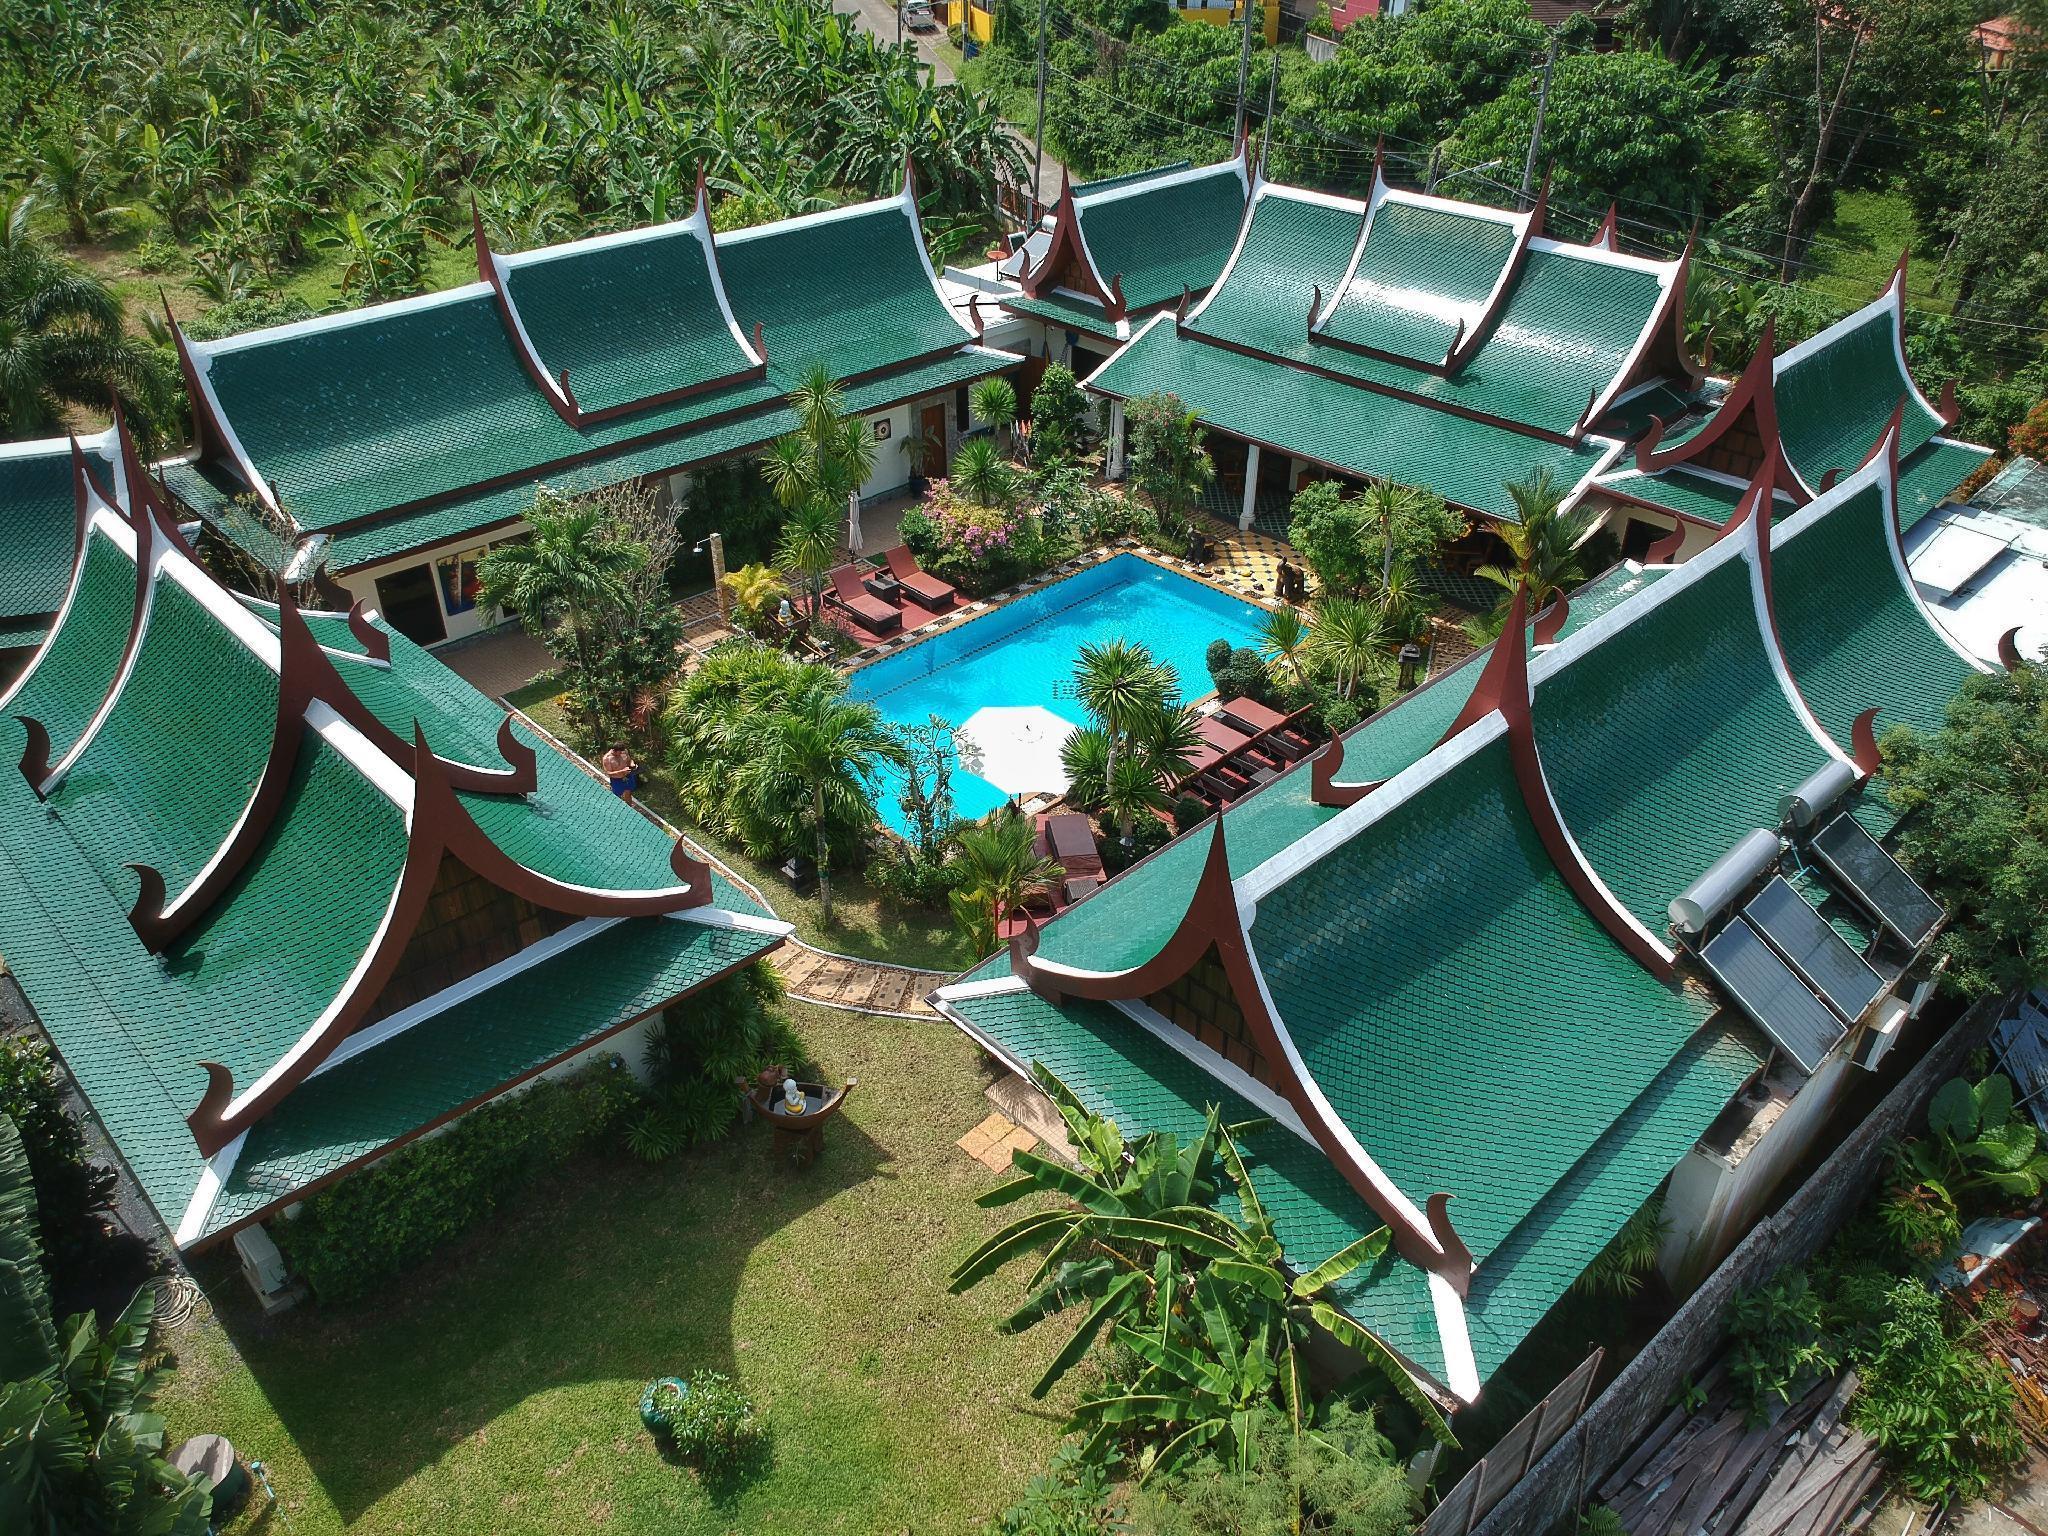 Baan Wanicha Bed and Breakfast Resort บ้าน วนิชา เบด แอนด์ เบรคฟาสต์ รีสอร์ต